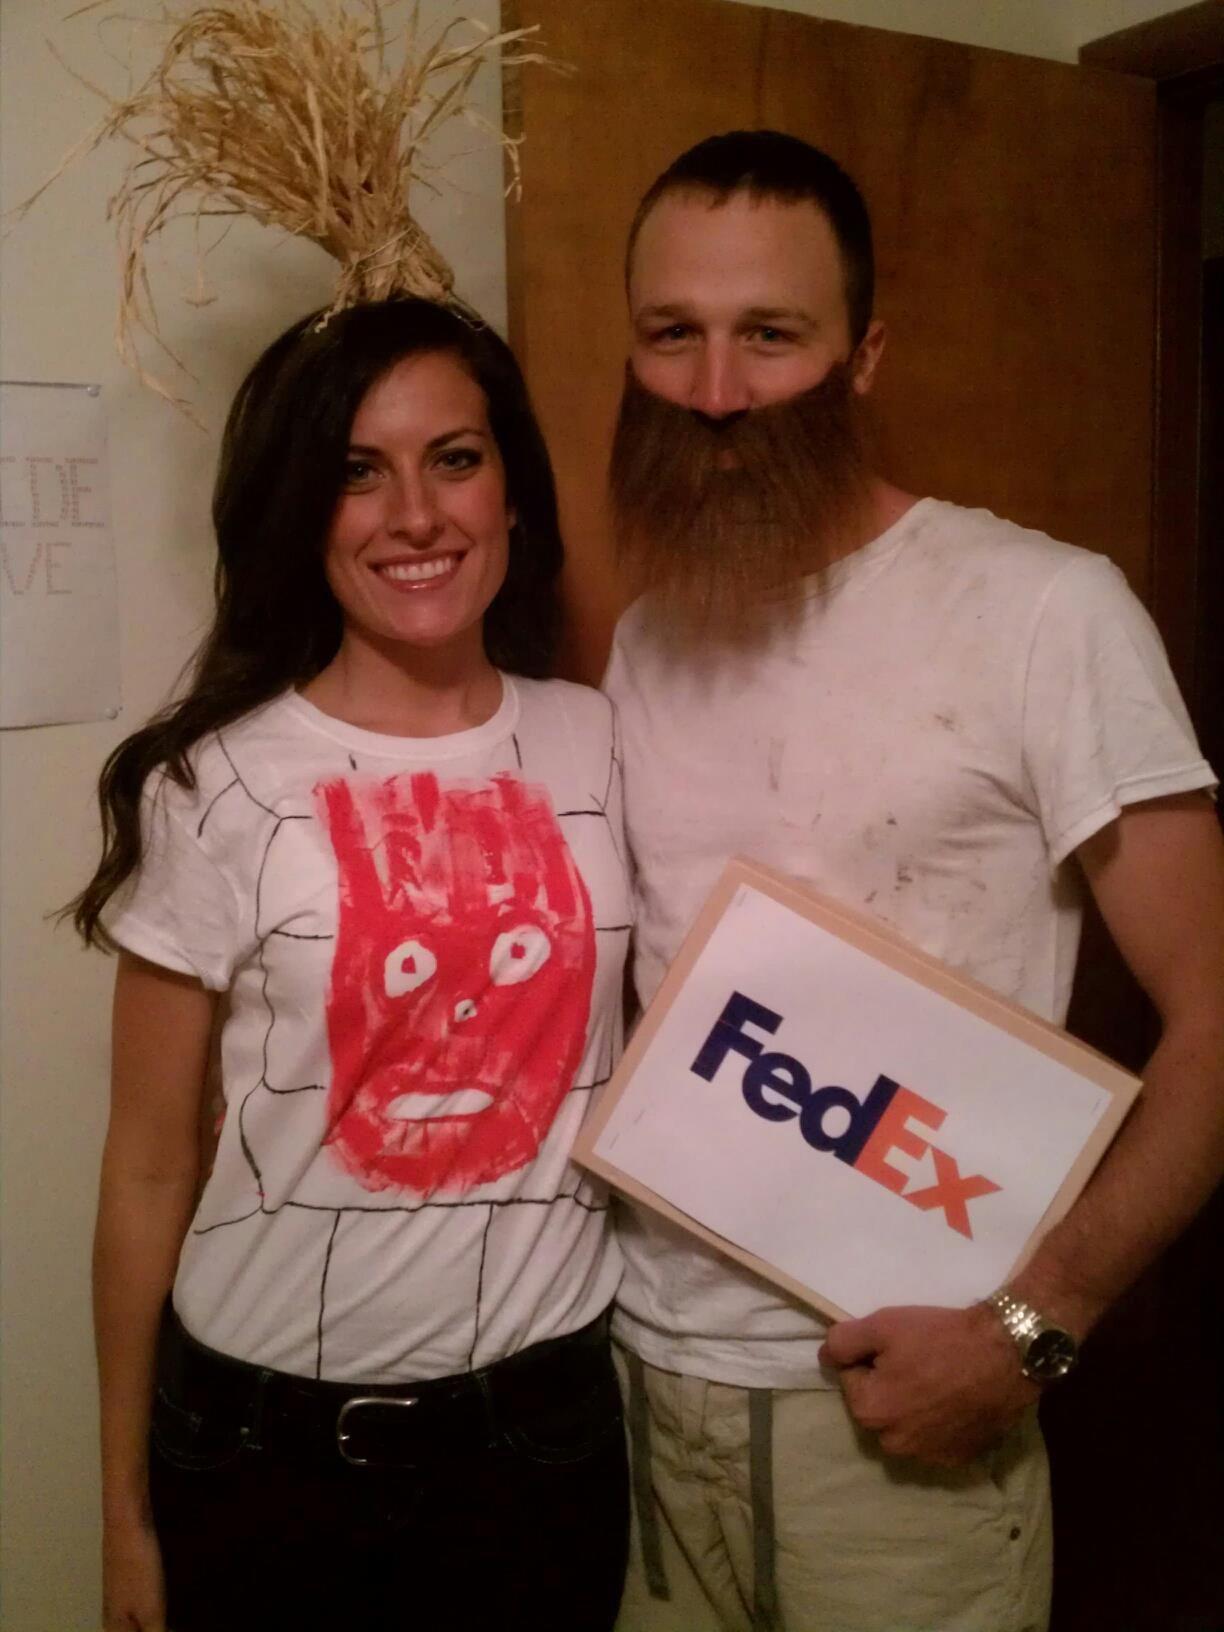 Couples Halloween Costume -Tom Hanks and Wilson (Castaway)  sc 1 st  Pinterest & Couples Halloween Costume -Tom Hanks and Wilson (Castaway ...